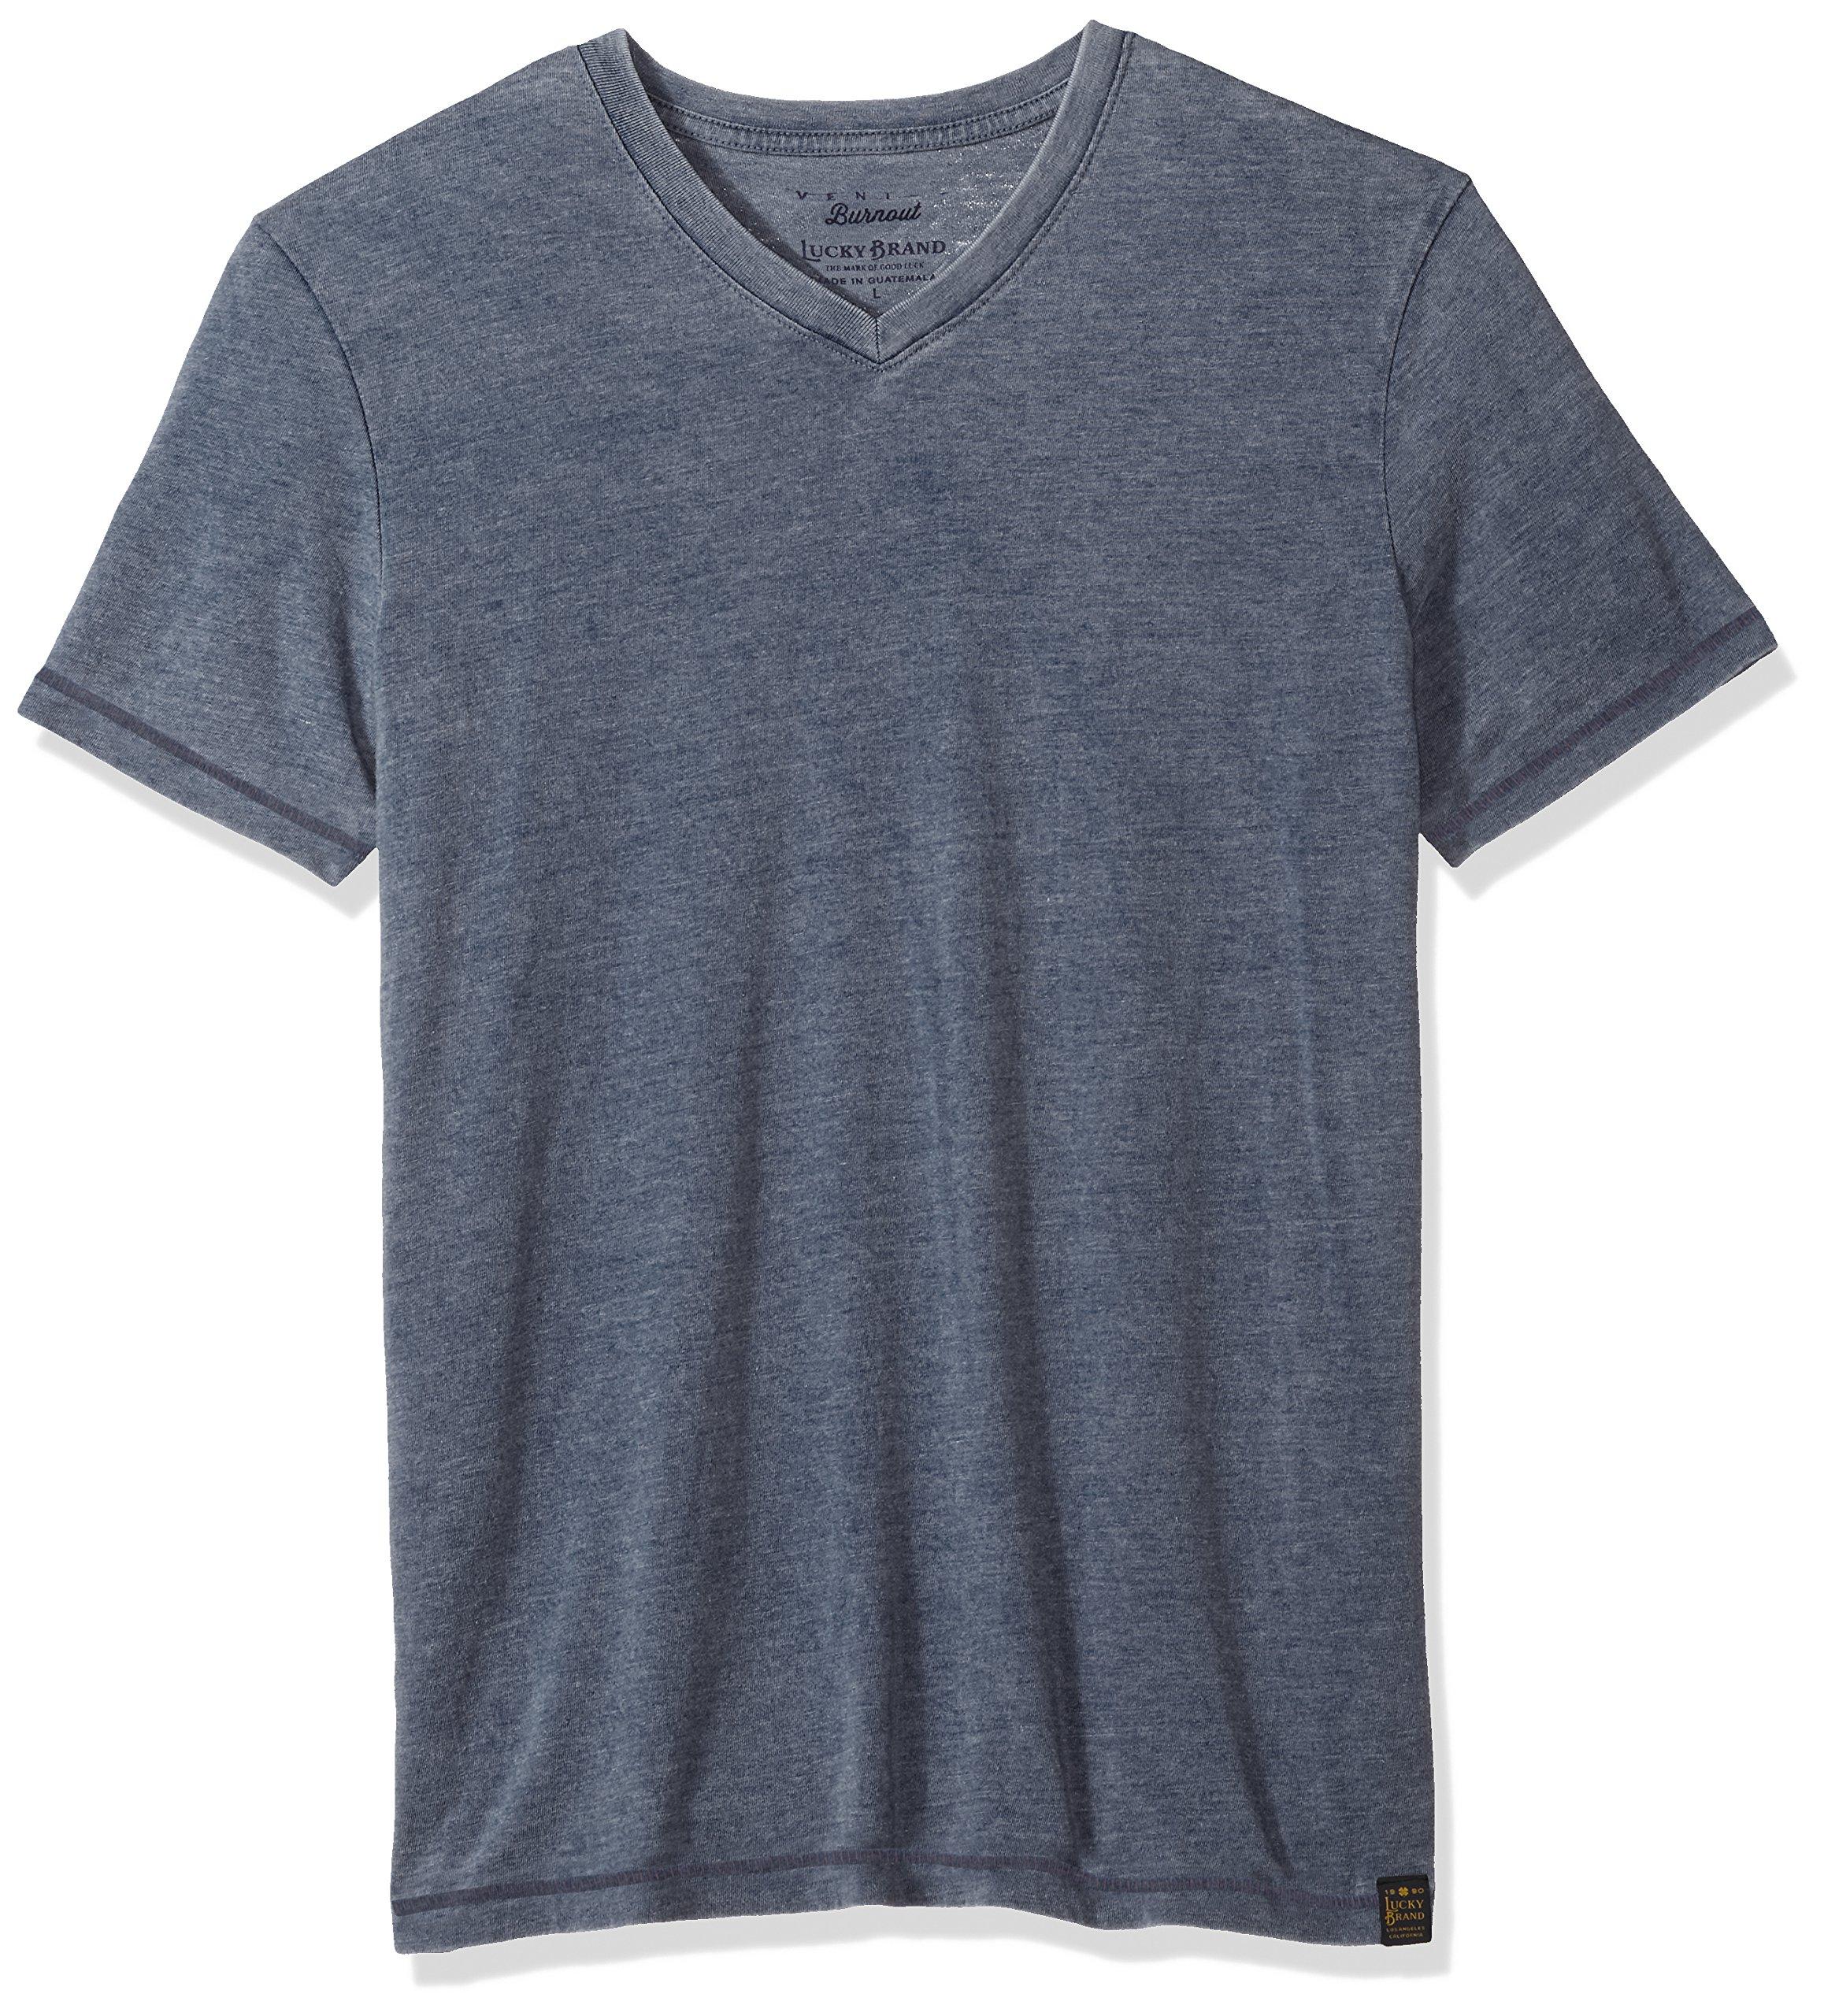 Lucky Brand Men's Venice Burnout V-Neck Tee Shirt, American Navy, L